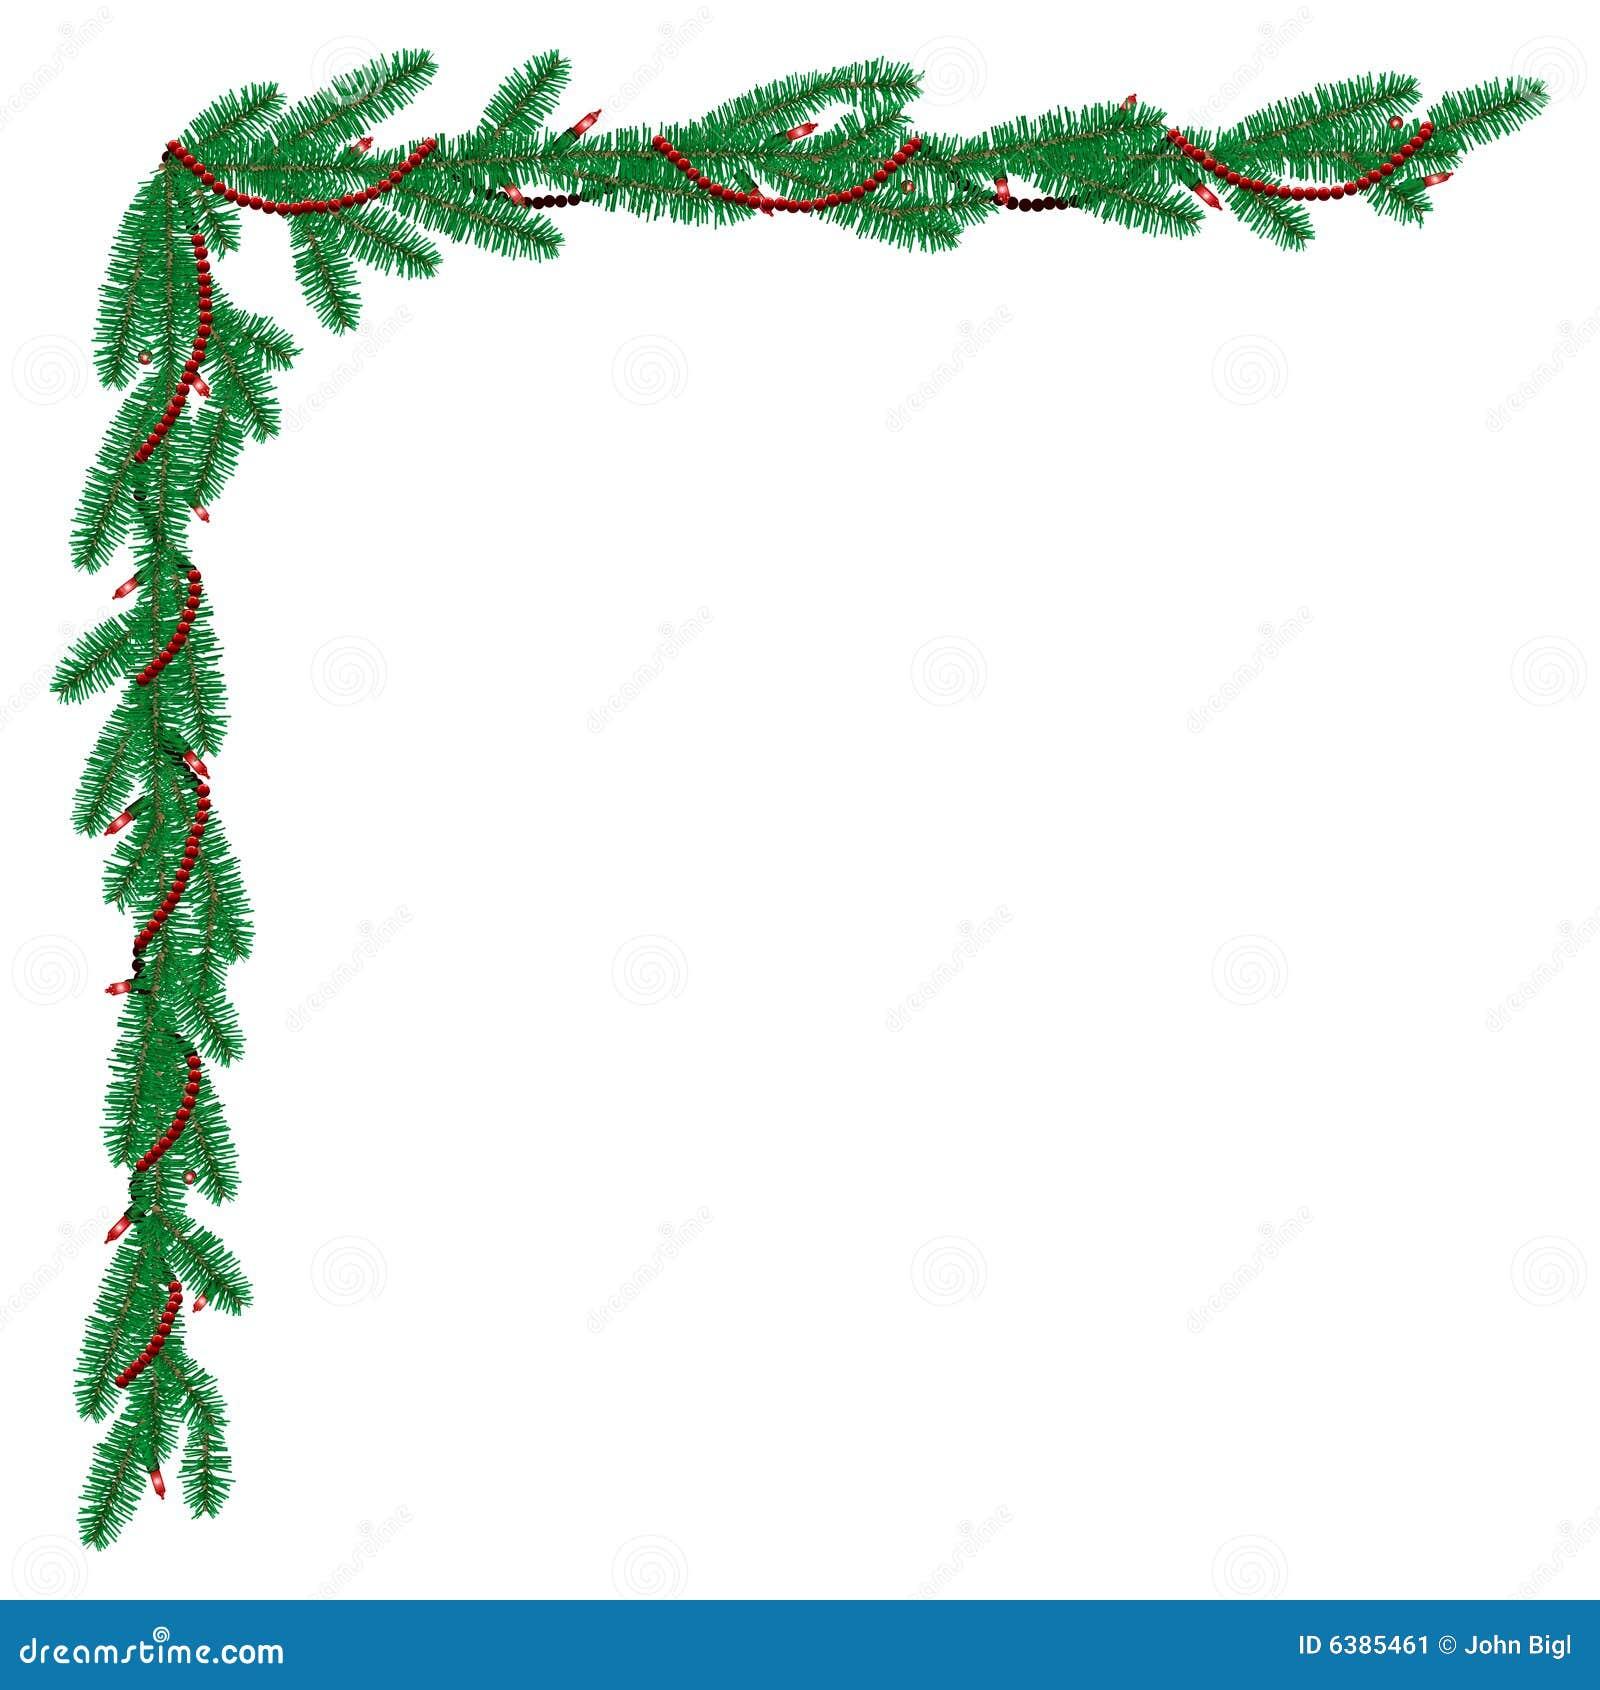 More similar stock images of ` Pine garland corner border `